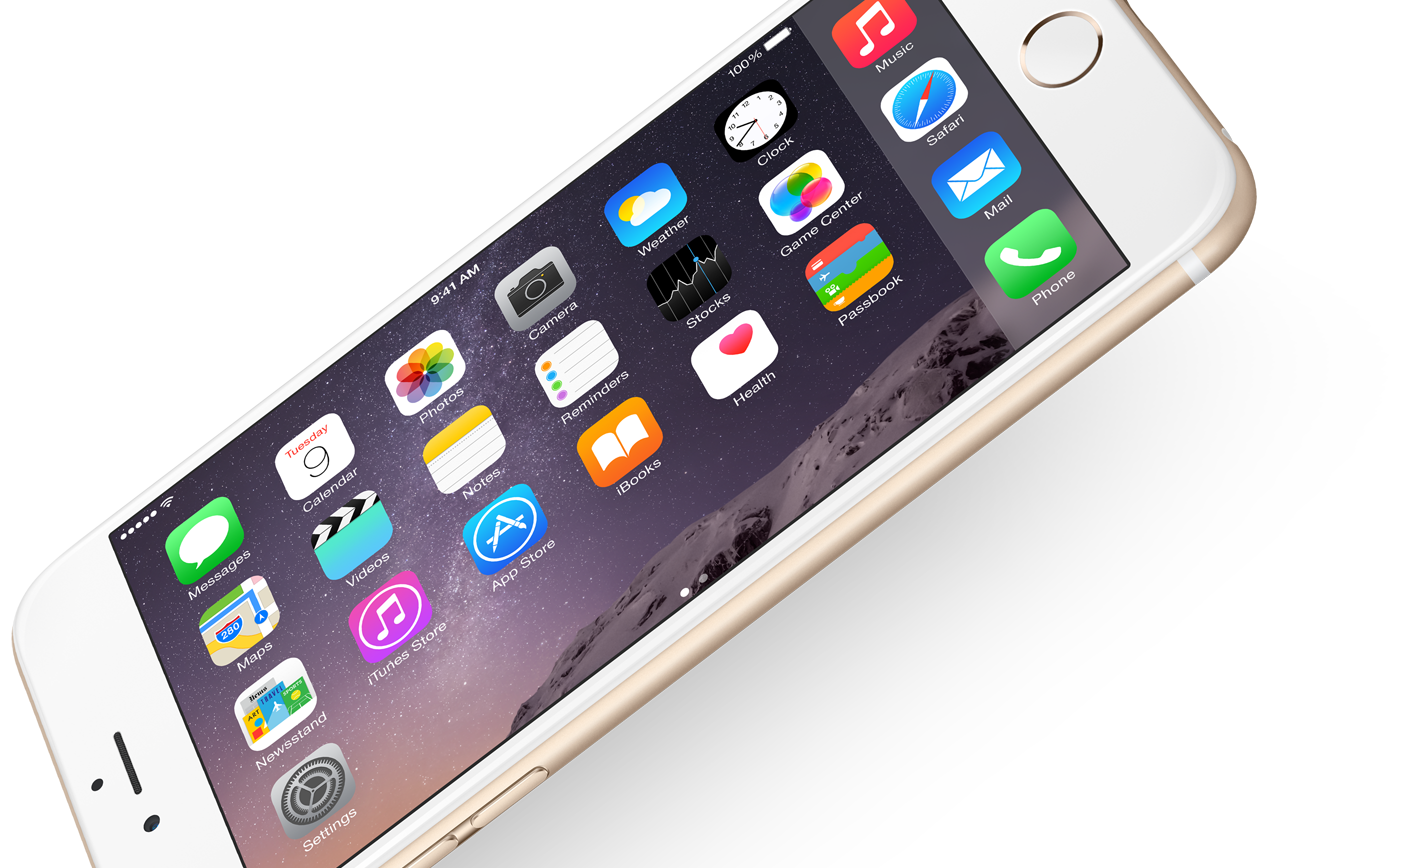 Обзор Apple iPhone 6 Plus: Full HD-экран, поддержка NFC и другие особенности гаджета